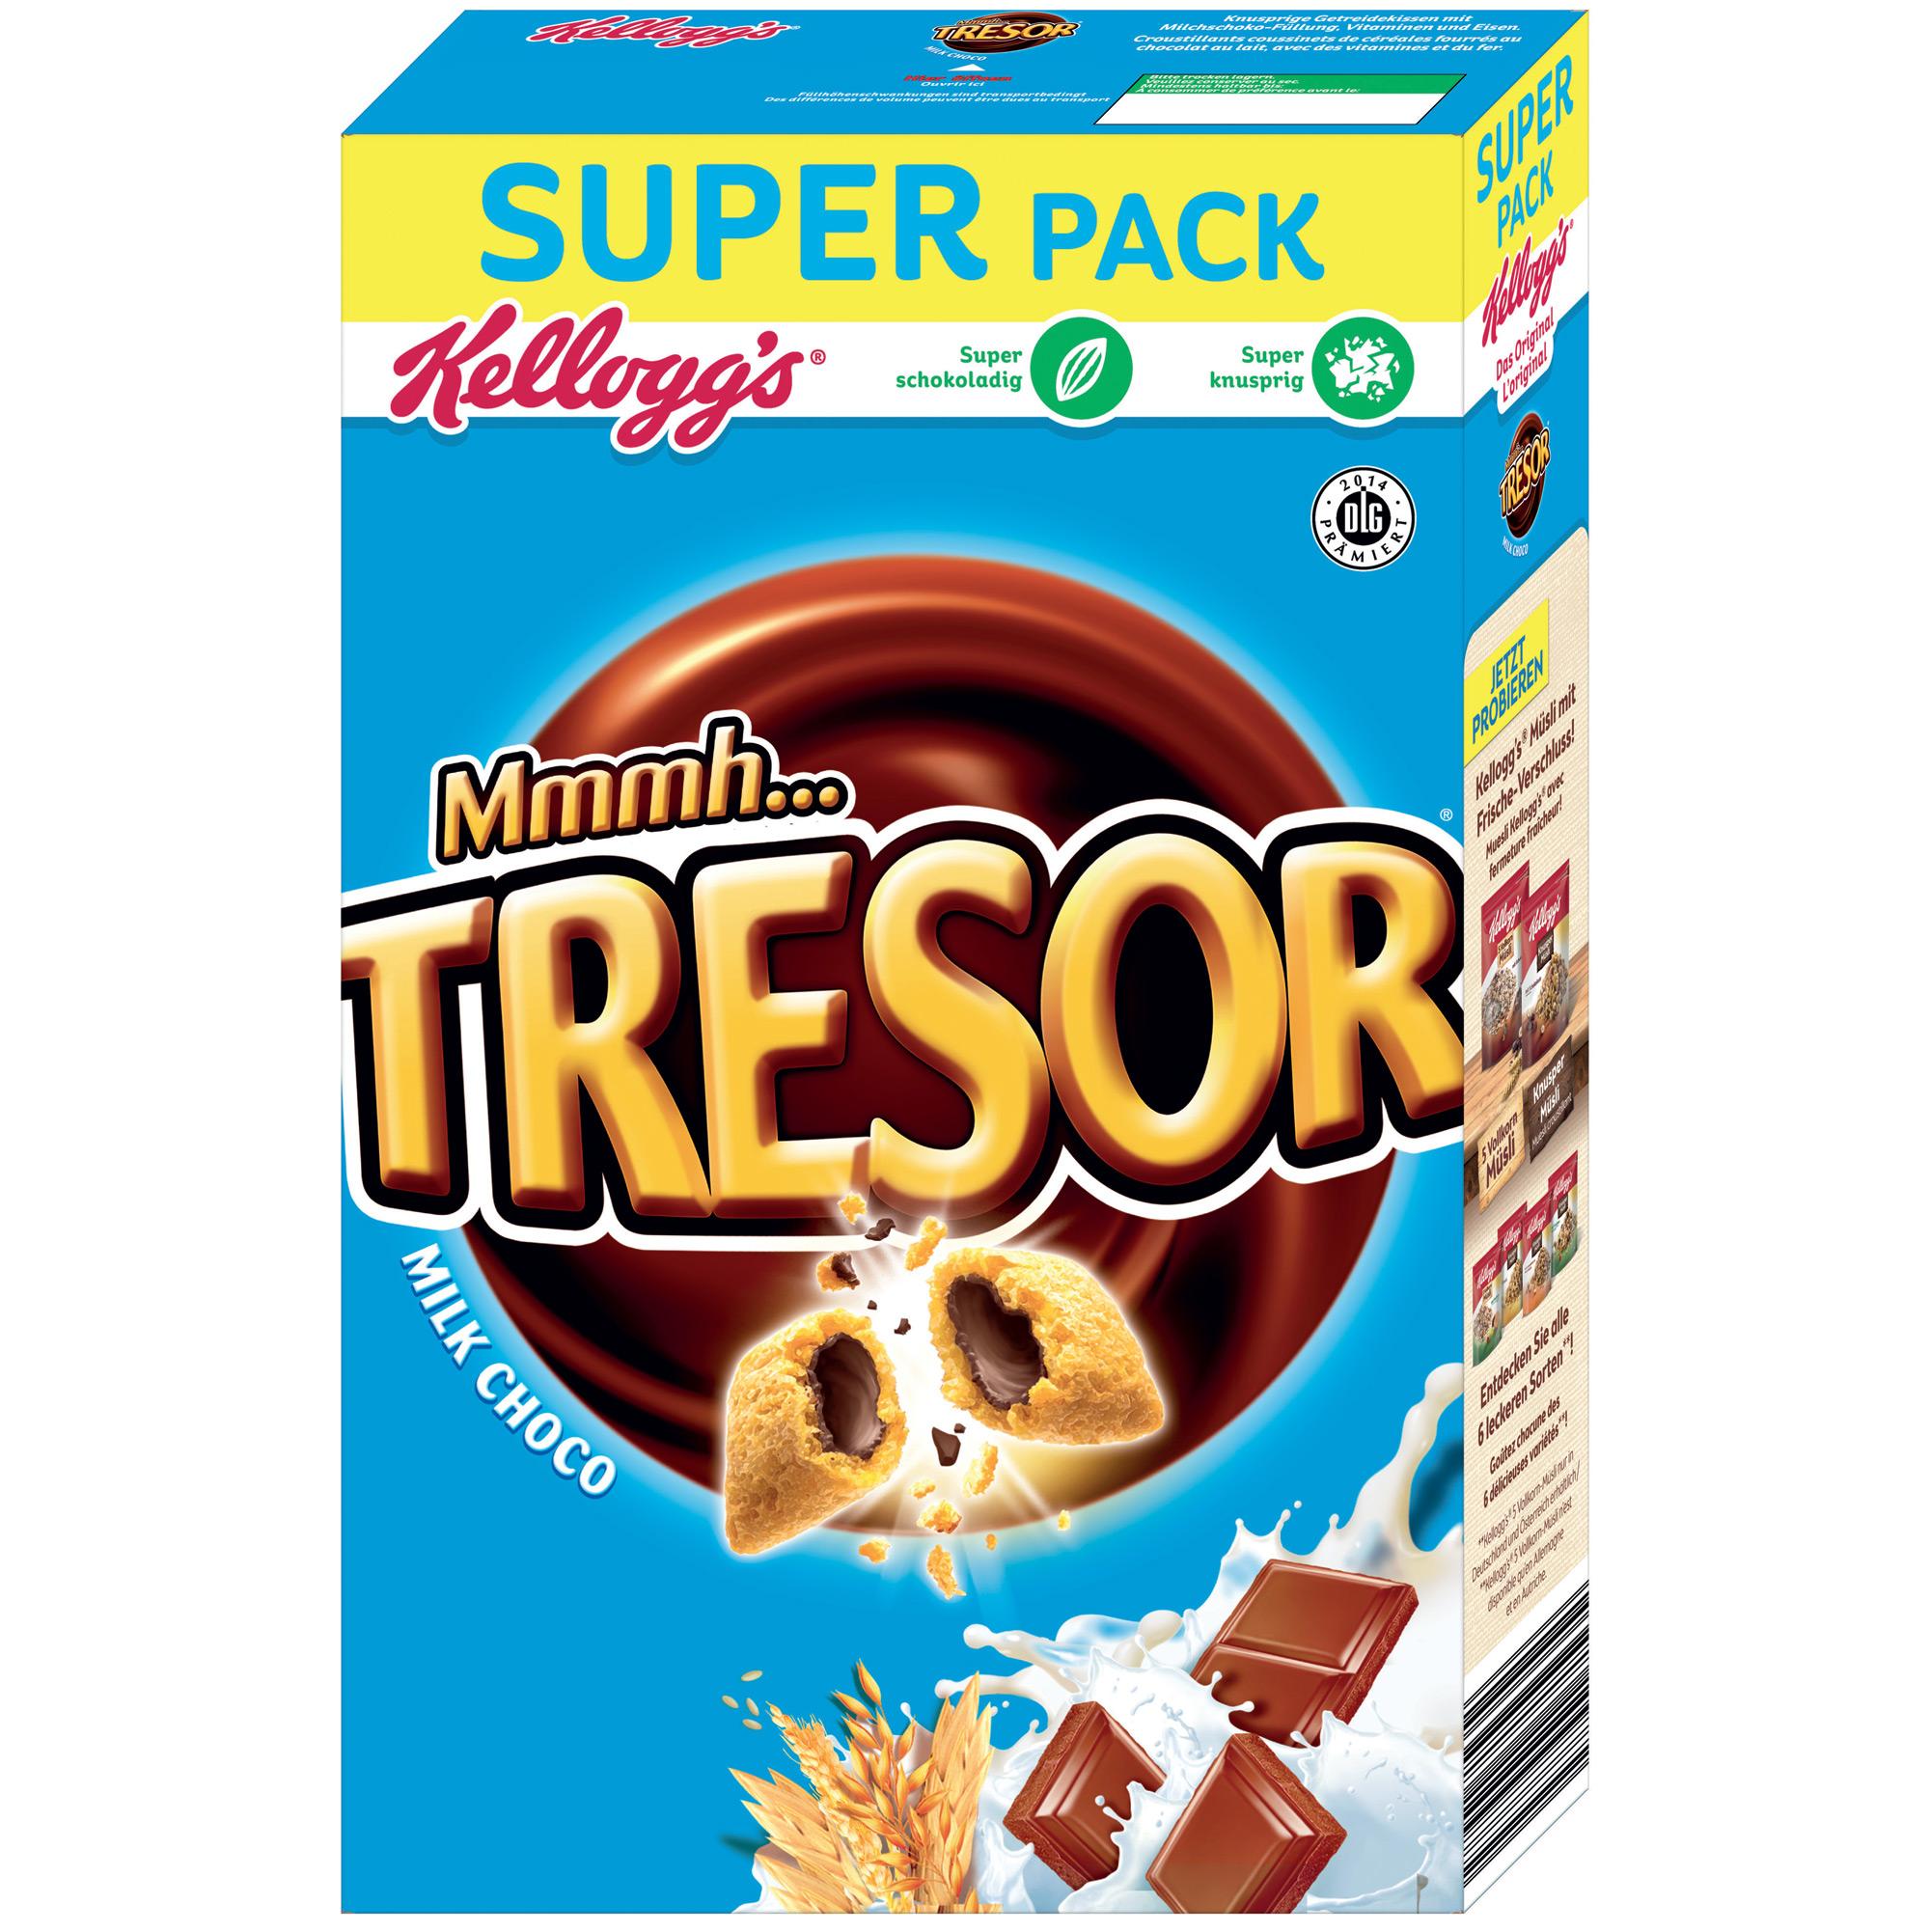 kellogg 39 s mmmh tresor milk choco super pack online kaufen im world of sweets shop. Black Bedroom Furniture Sets. Home Design Ideas